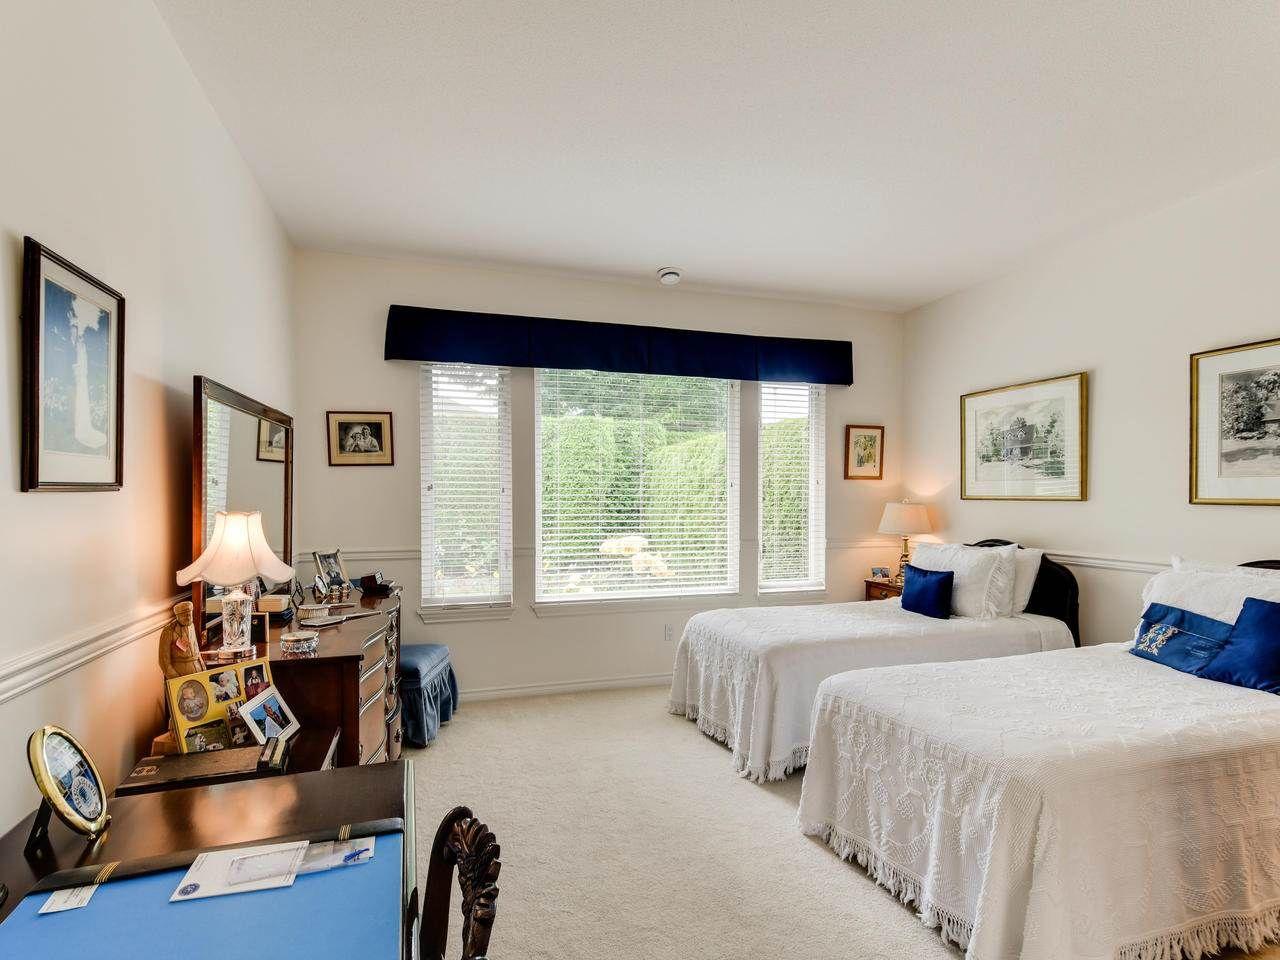 "Photo 13: Photos: 23 14888 24 Avenue in Surrey: Sunnyside Park Surrey Townhouse for sale in ""Meridian Park Estates"" (South Surrey White Rock)  : MLS®# R2381989"